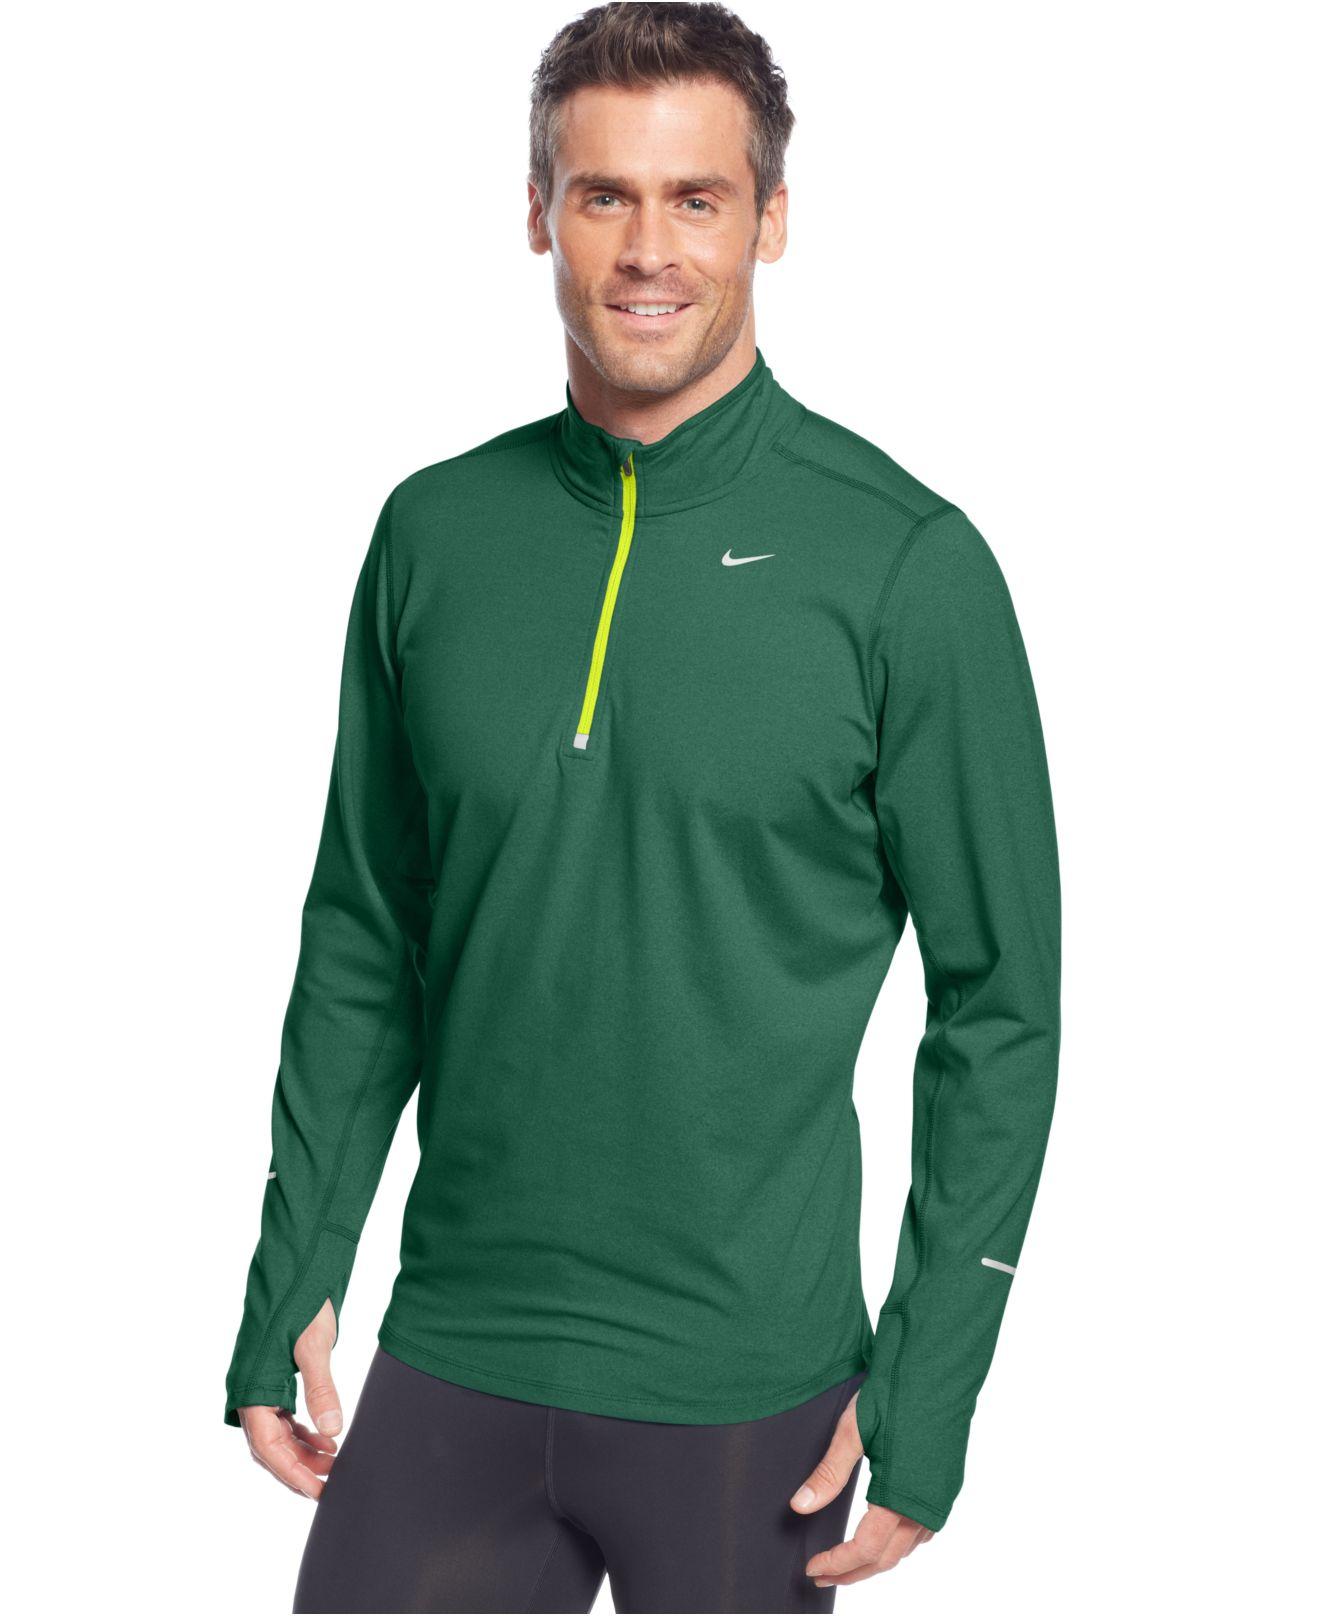 cbdf0047 Nike Pullover Element Half Zip Shirt in Green for Men - Lyst